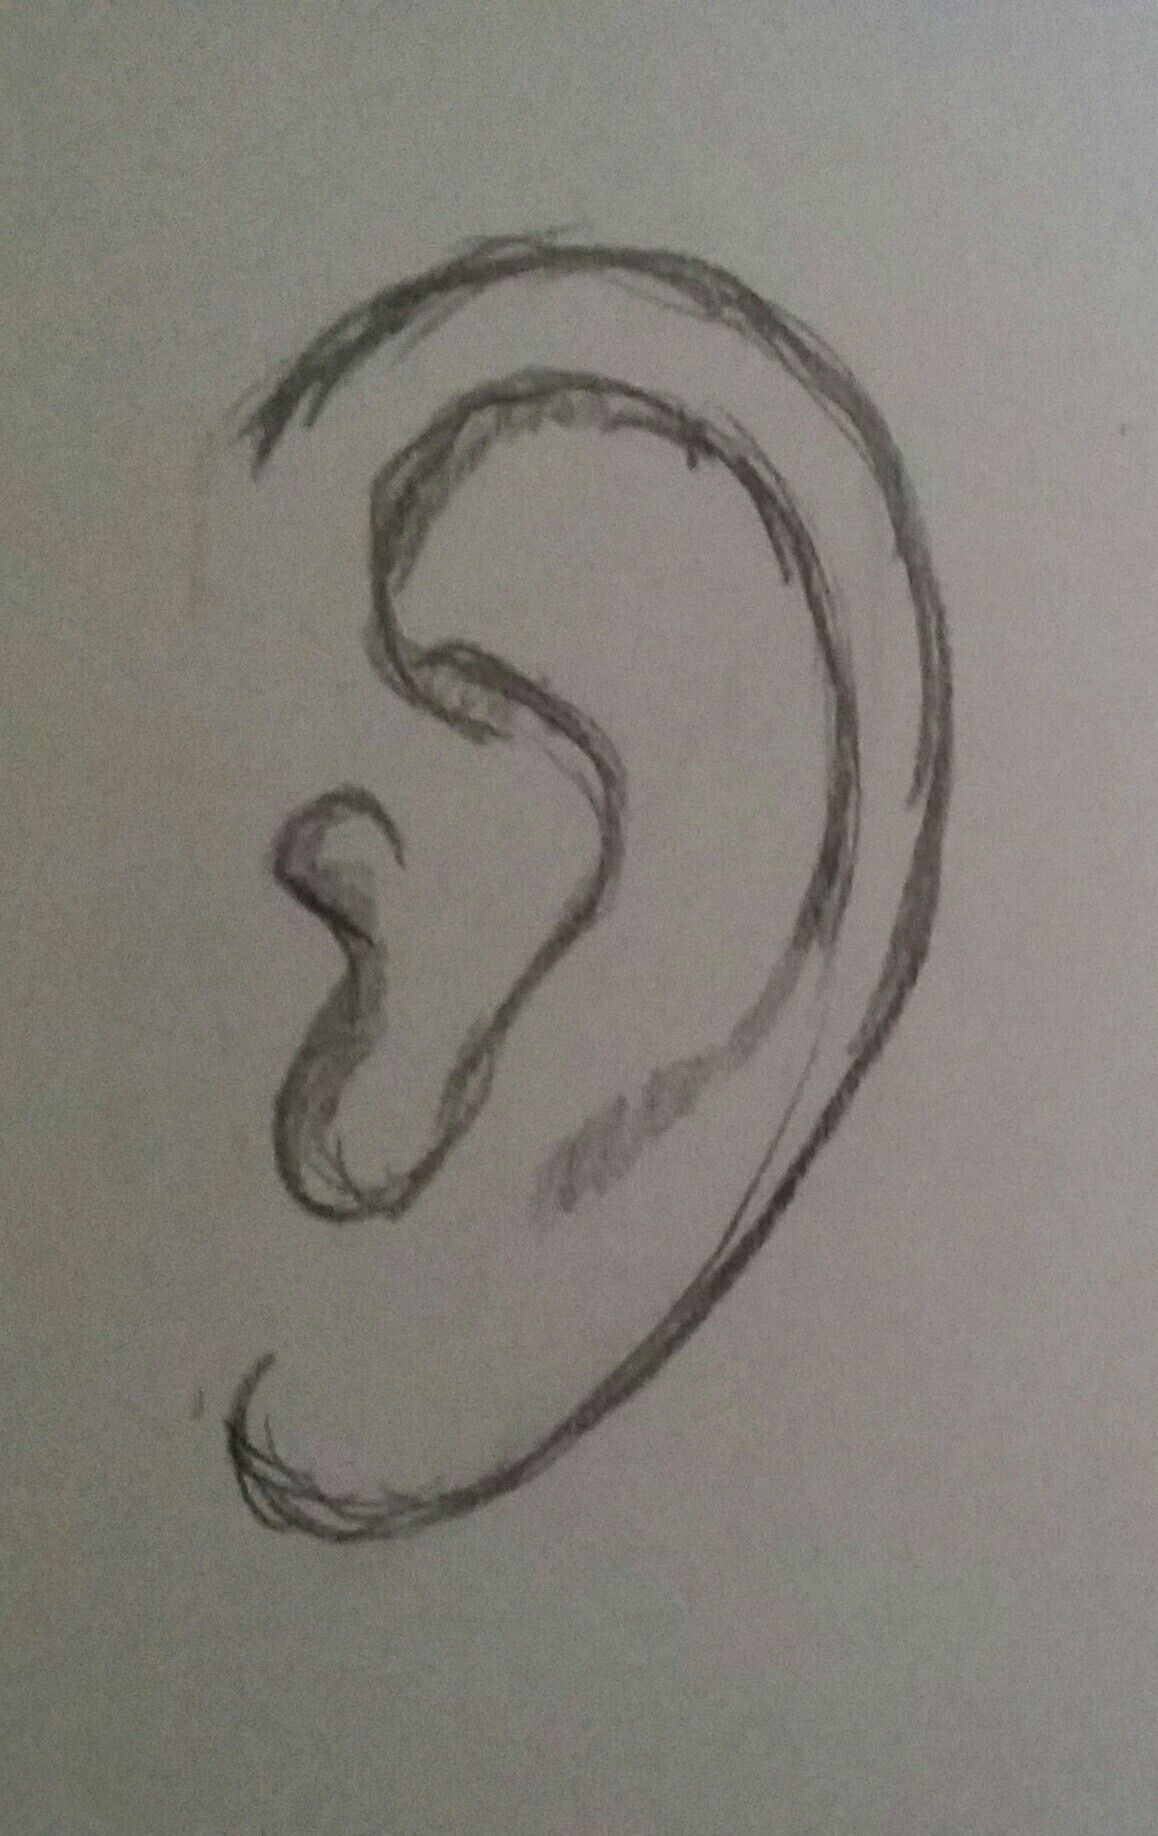 Easy Ear Pencil Drawing Pencil Drawings Easy Pencil Art Drawings Art Drawings Sketches Simple